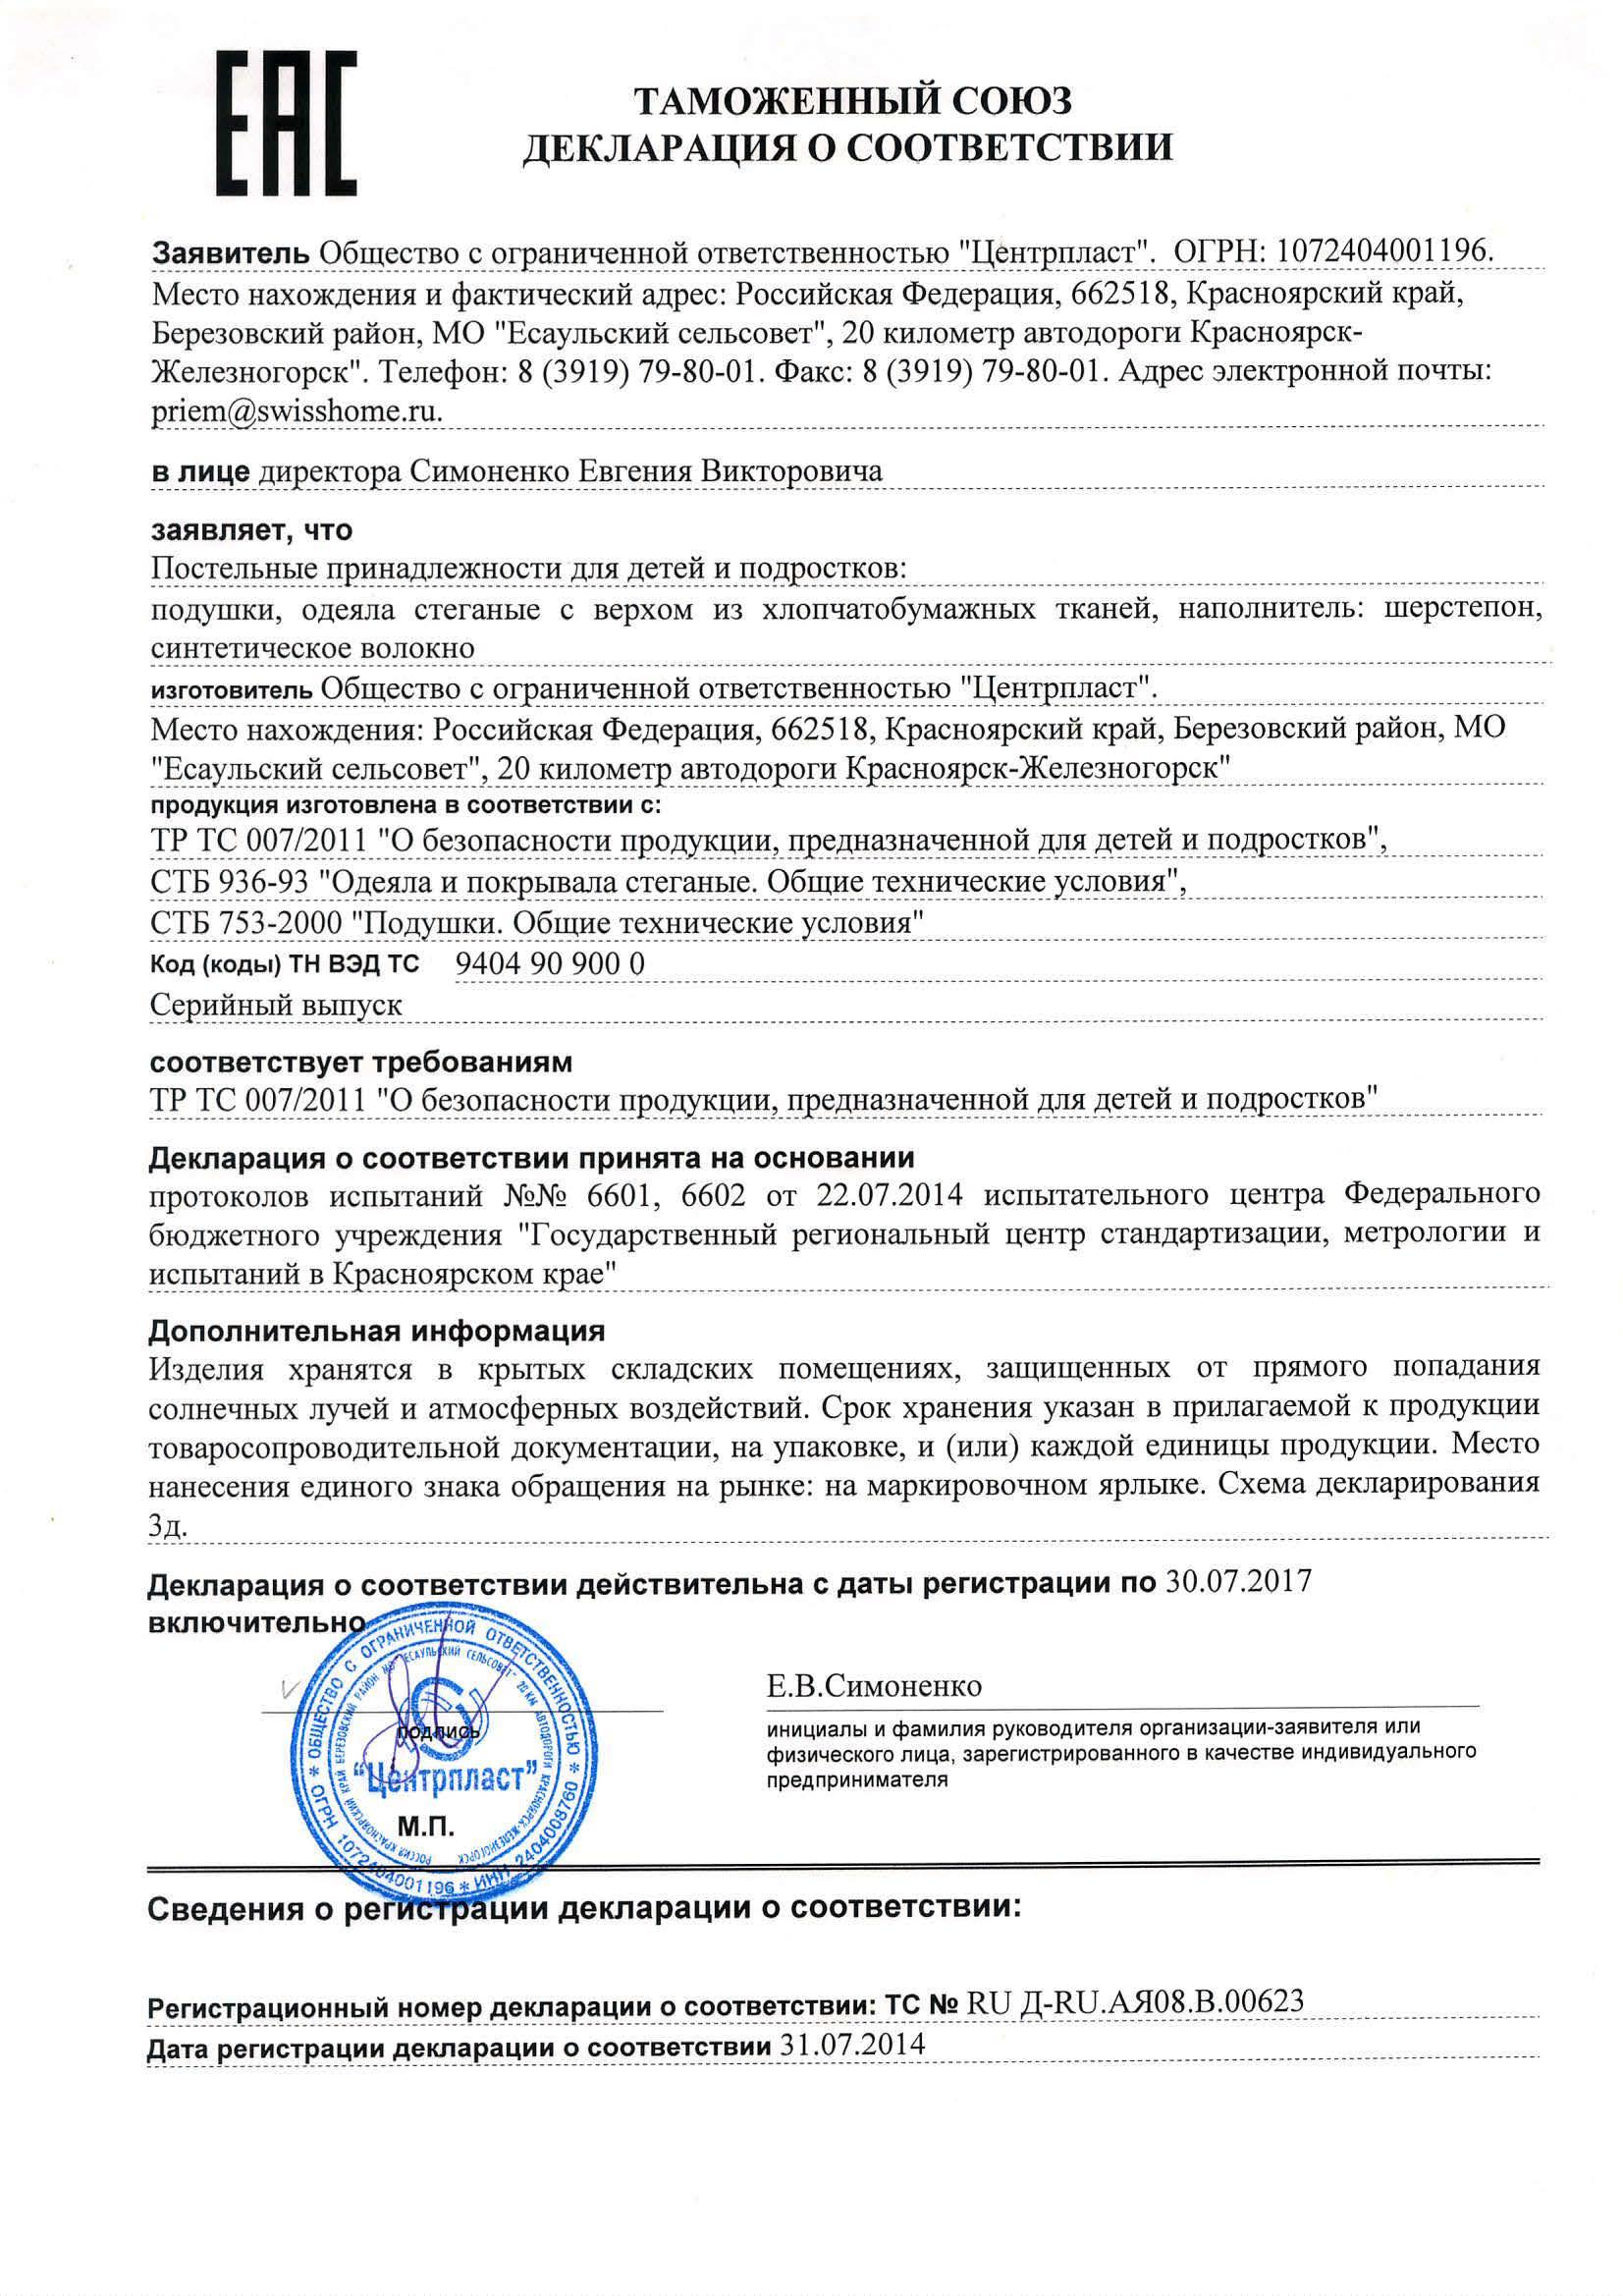 http://swisshomeshop.ru/images/upload/EAC%20%20ДЕТСКИЕ%20ПОДУШКИ%20И%20ОДЕЯЛА.jpg